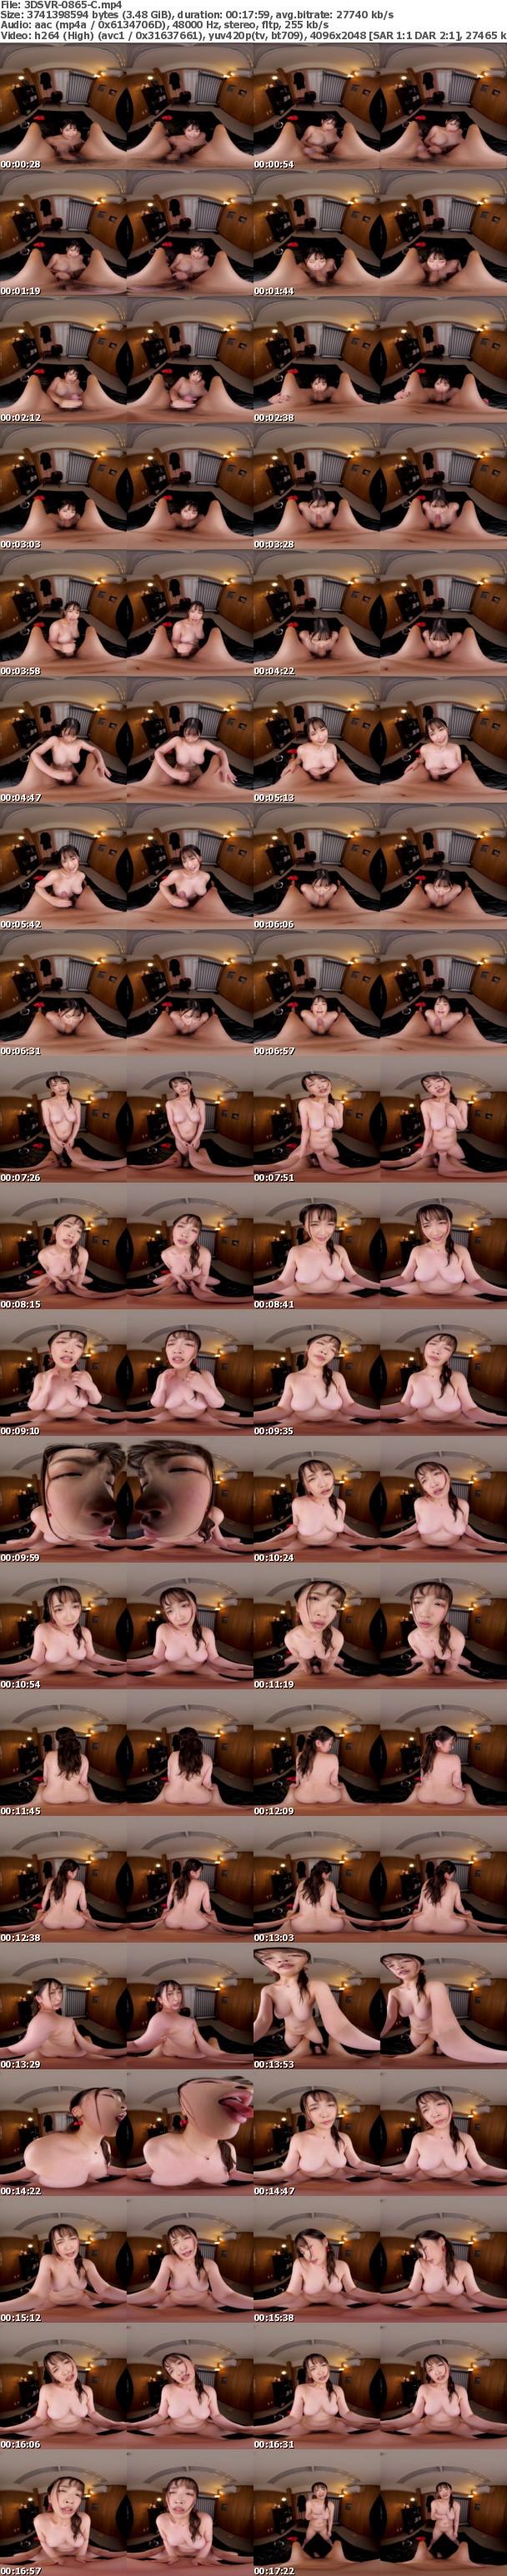 (VR) 3DSVR-0865 宅配ソープVR 初々しさ全開の美園和花ちゃんが自慢のむっちりボディで神乳神尻ご奉仕プレイ!